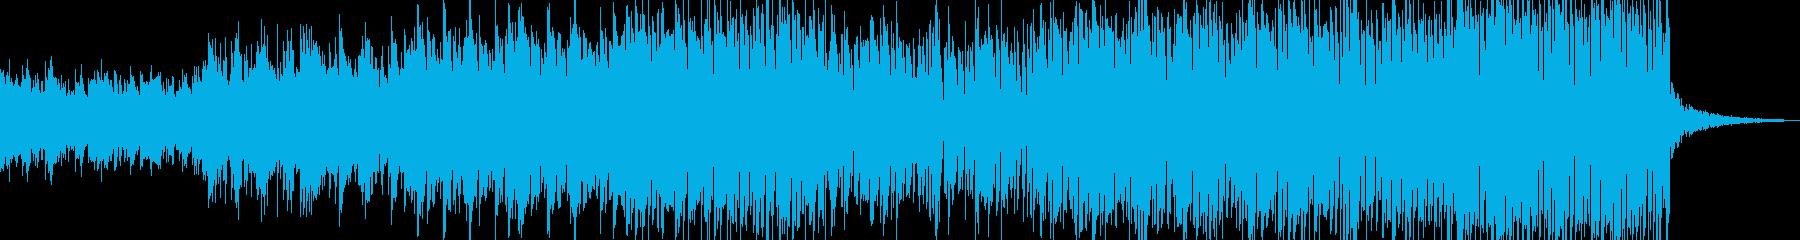 【CM】ワクワクさせるフューチャーハウスの再生済みの波形